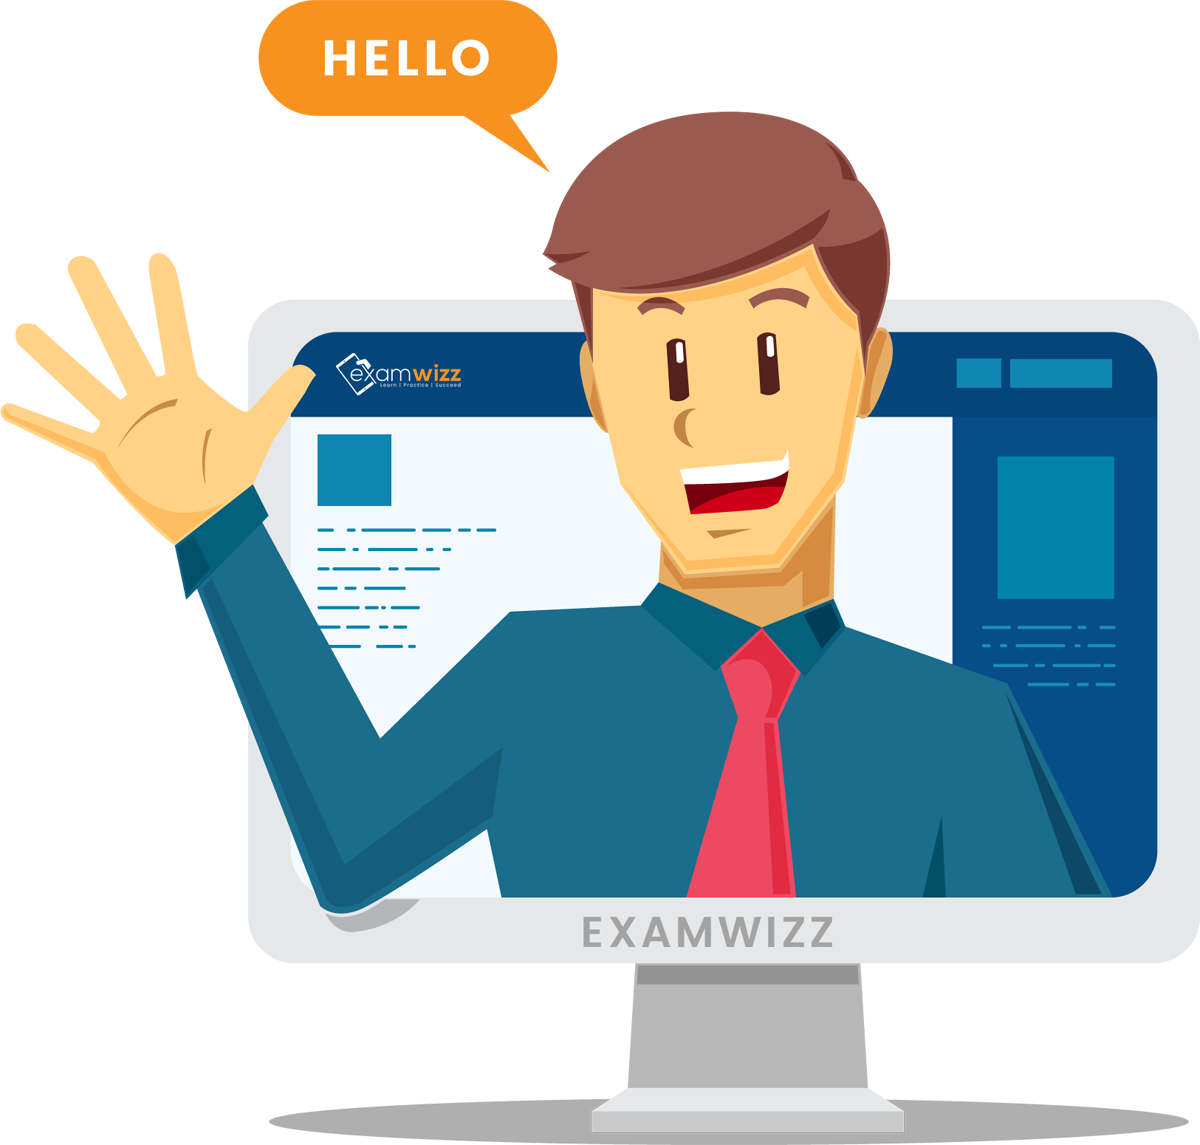 11 Plus Exam, Practice Tests Online, 11 Plus Exam Questions, 11 Plus Learning